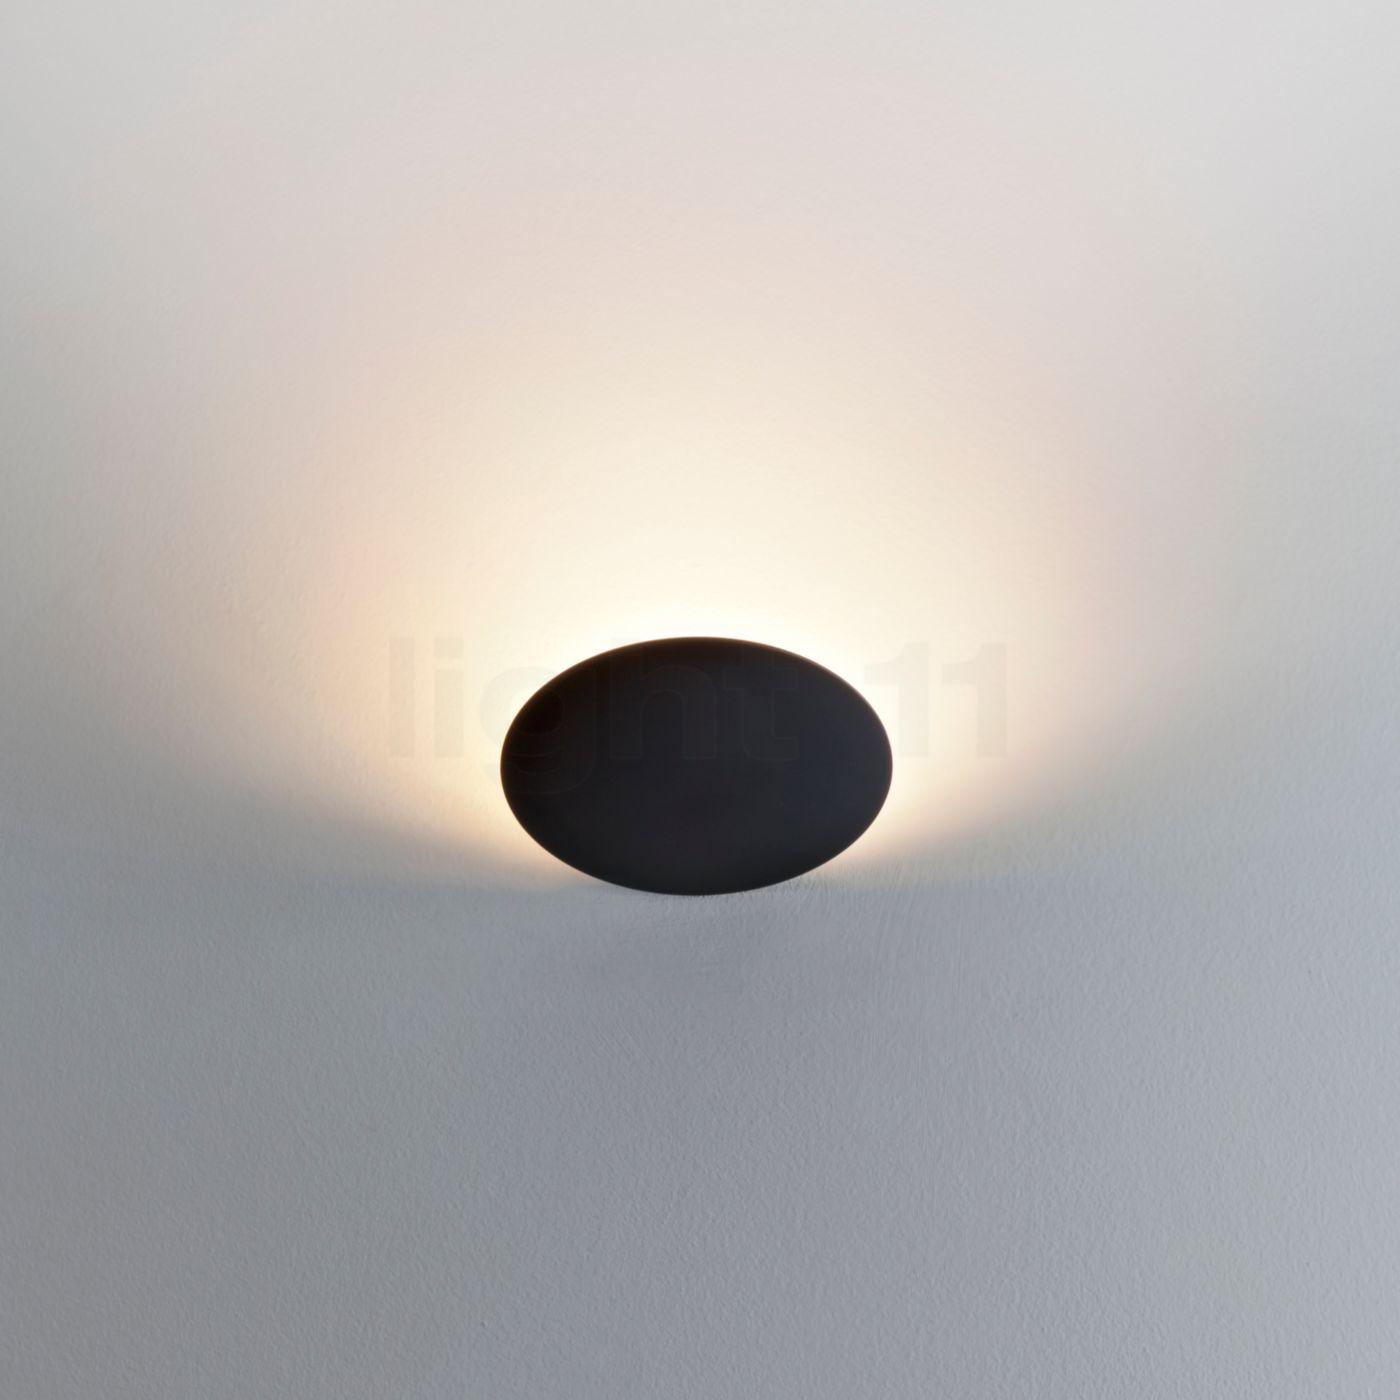 Catellani & Smith Lederam WF ø25 cm Wall-mounted light